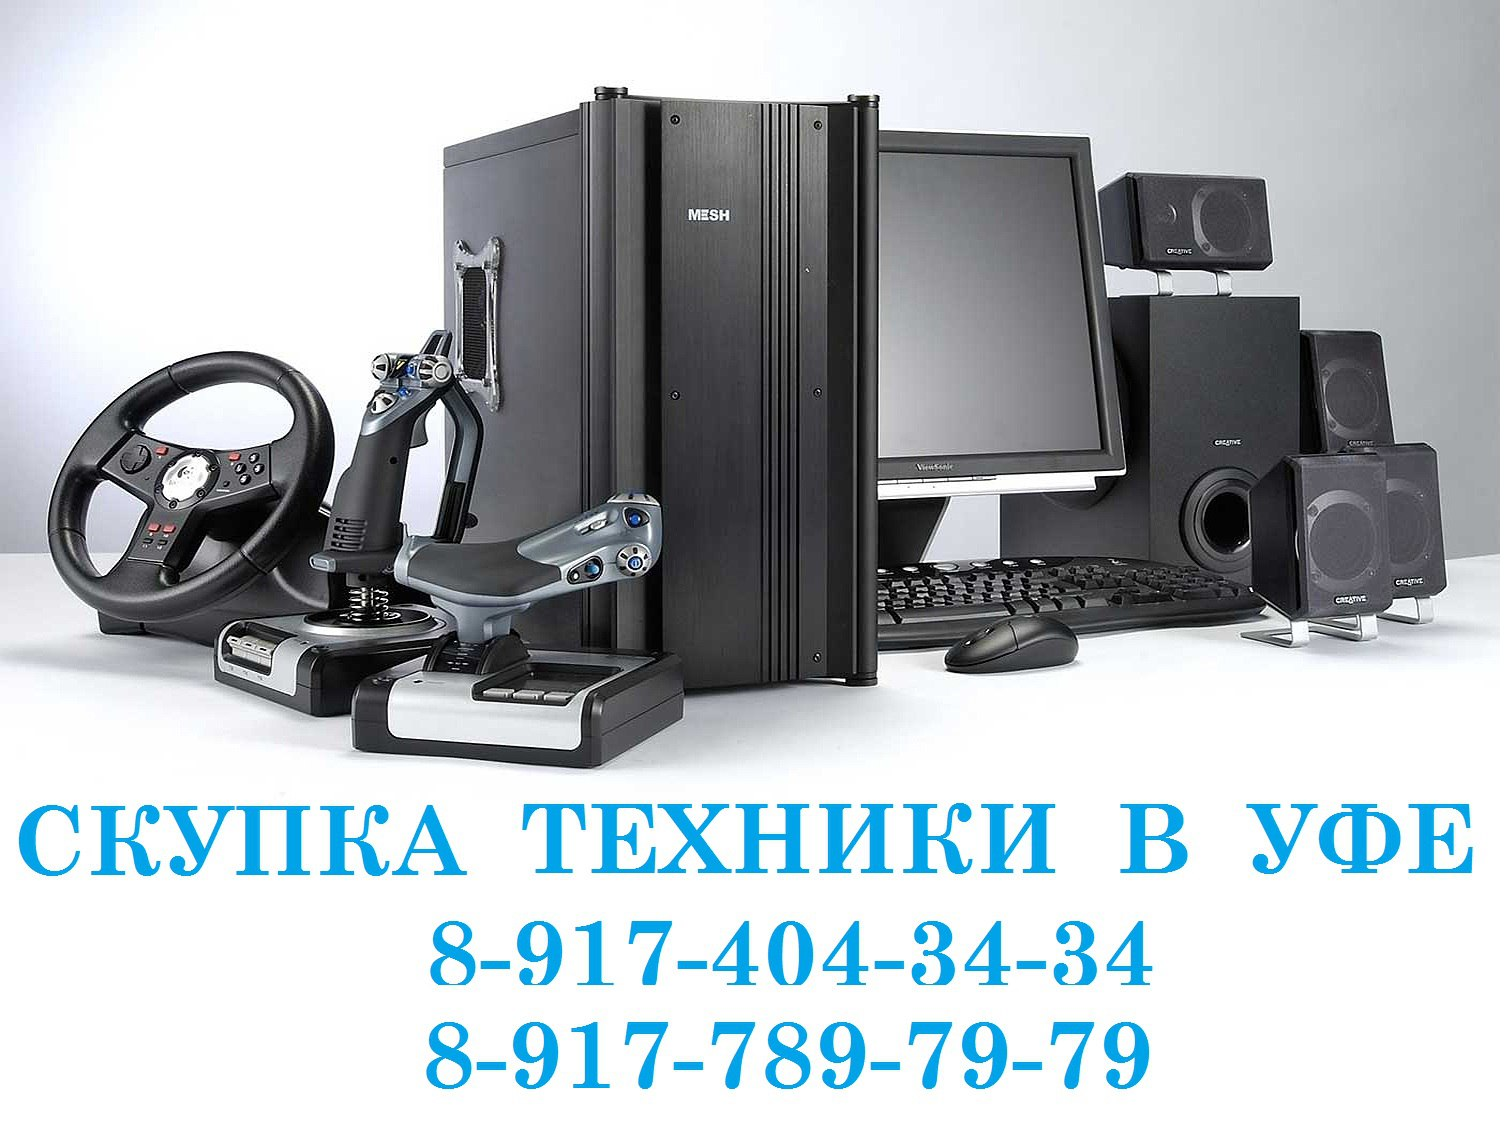 Скупка компьютеров в Уфе http://www.uco.su/catalog/skupka-kompyuterov-v-ufe-